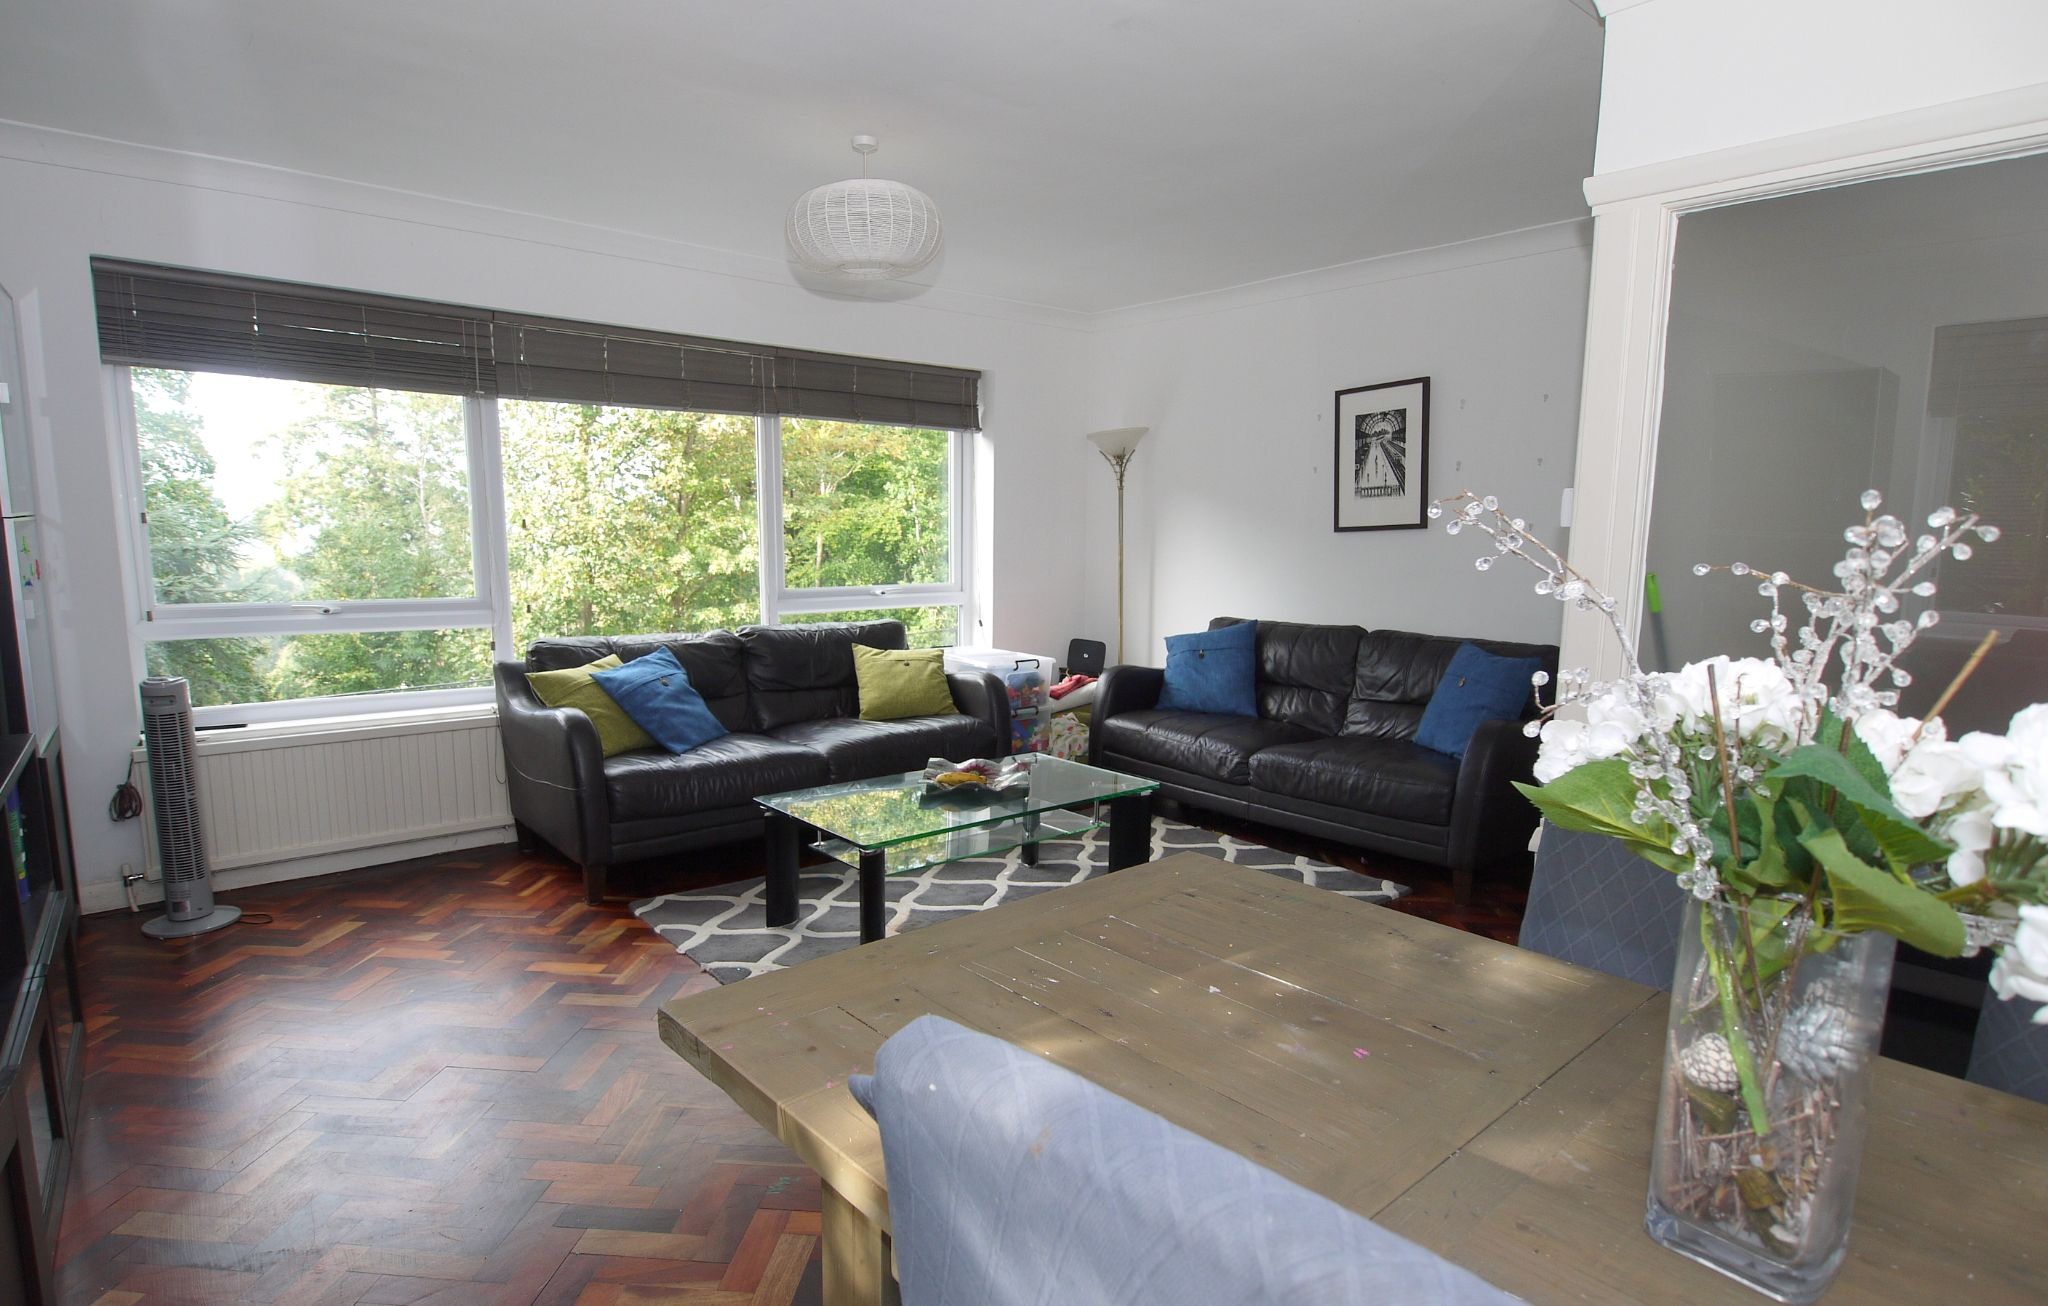 3 bedroom apartment Sold in Sevenoaks - Photograph 2